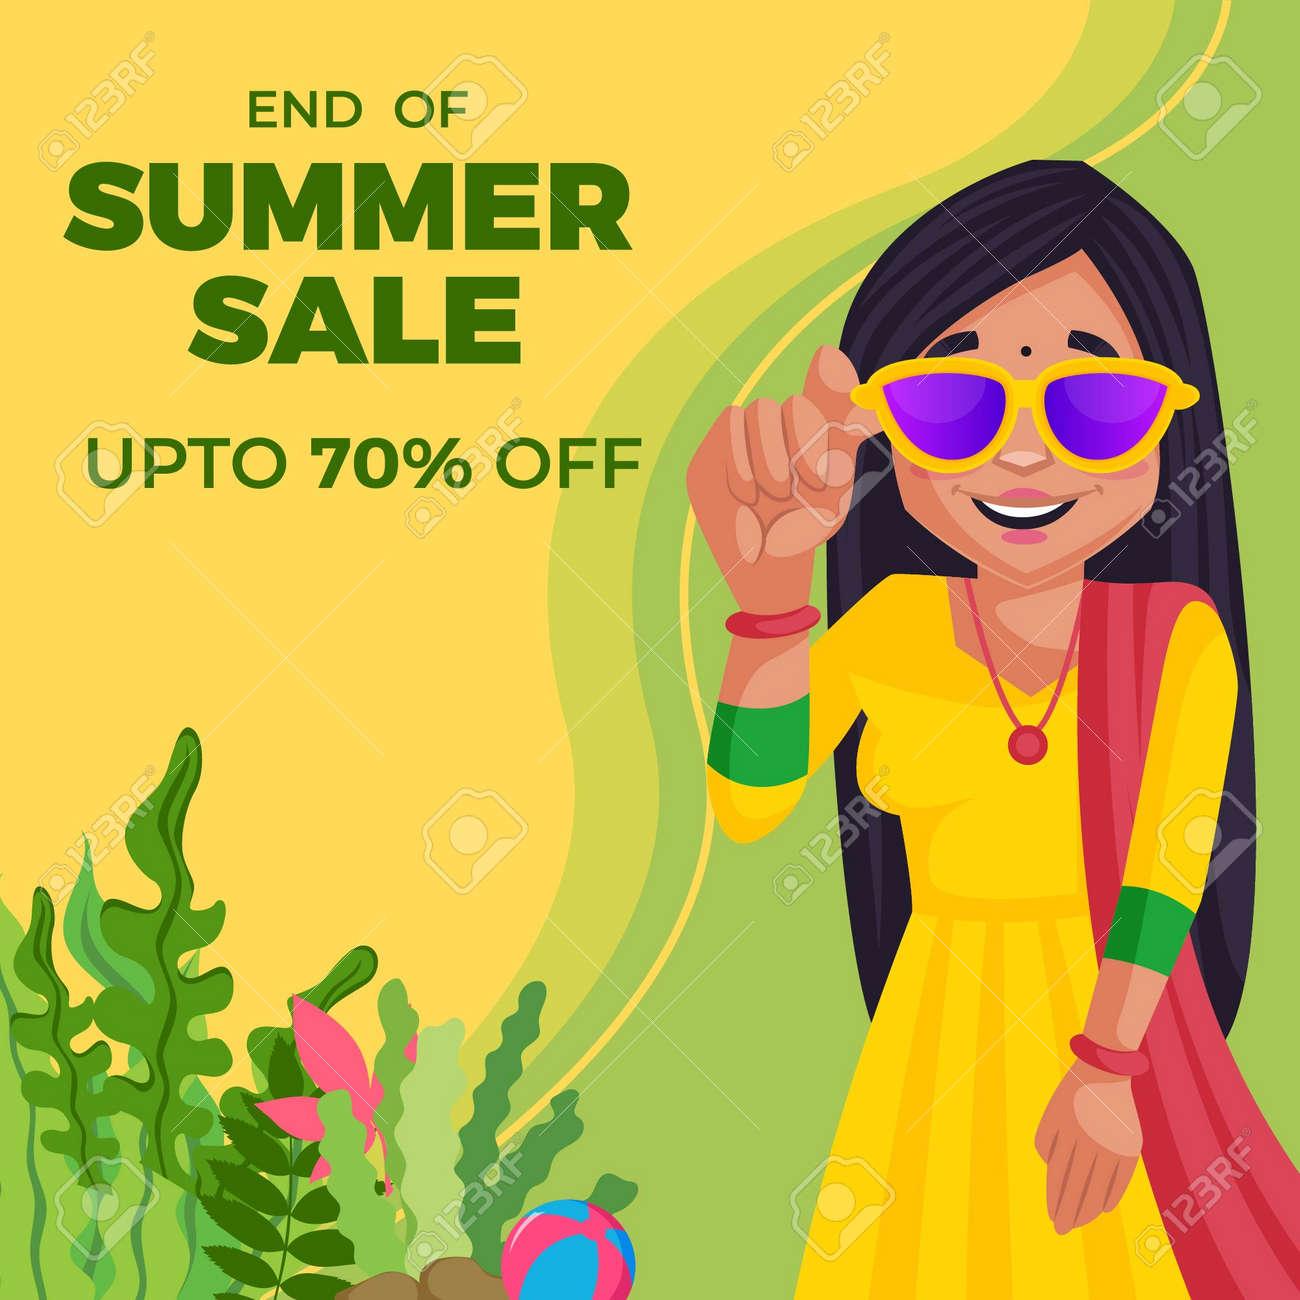 End Of Summer Sale banner design template. Vector graphic illustration. - 171725670